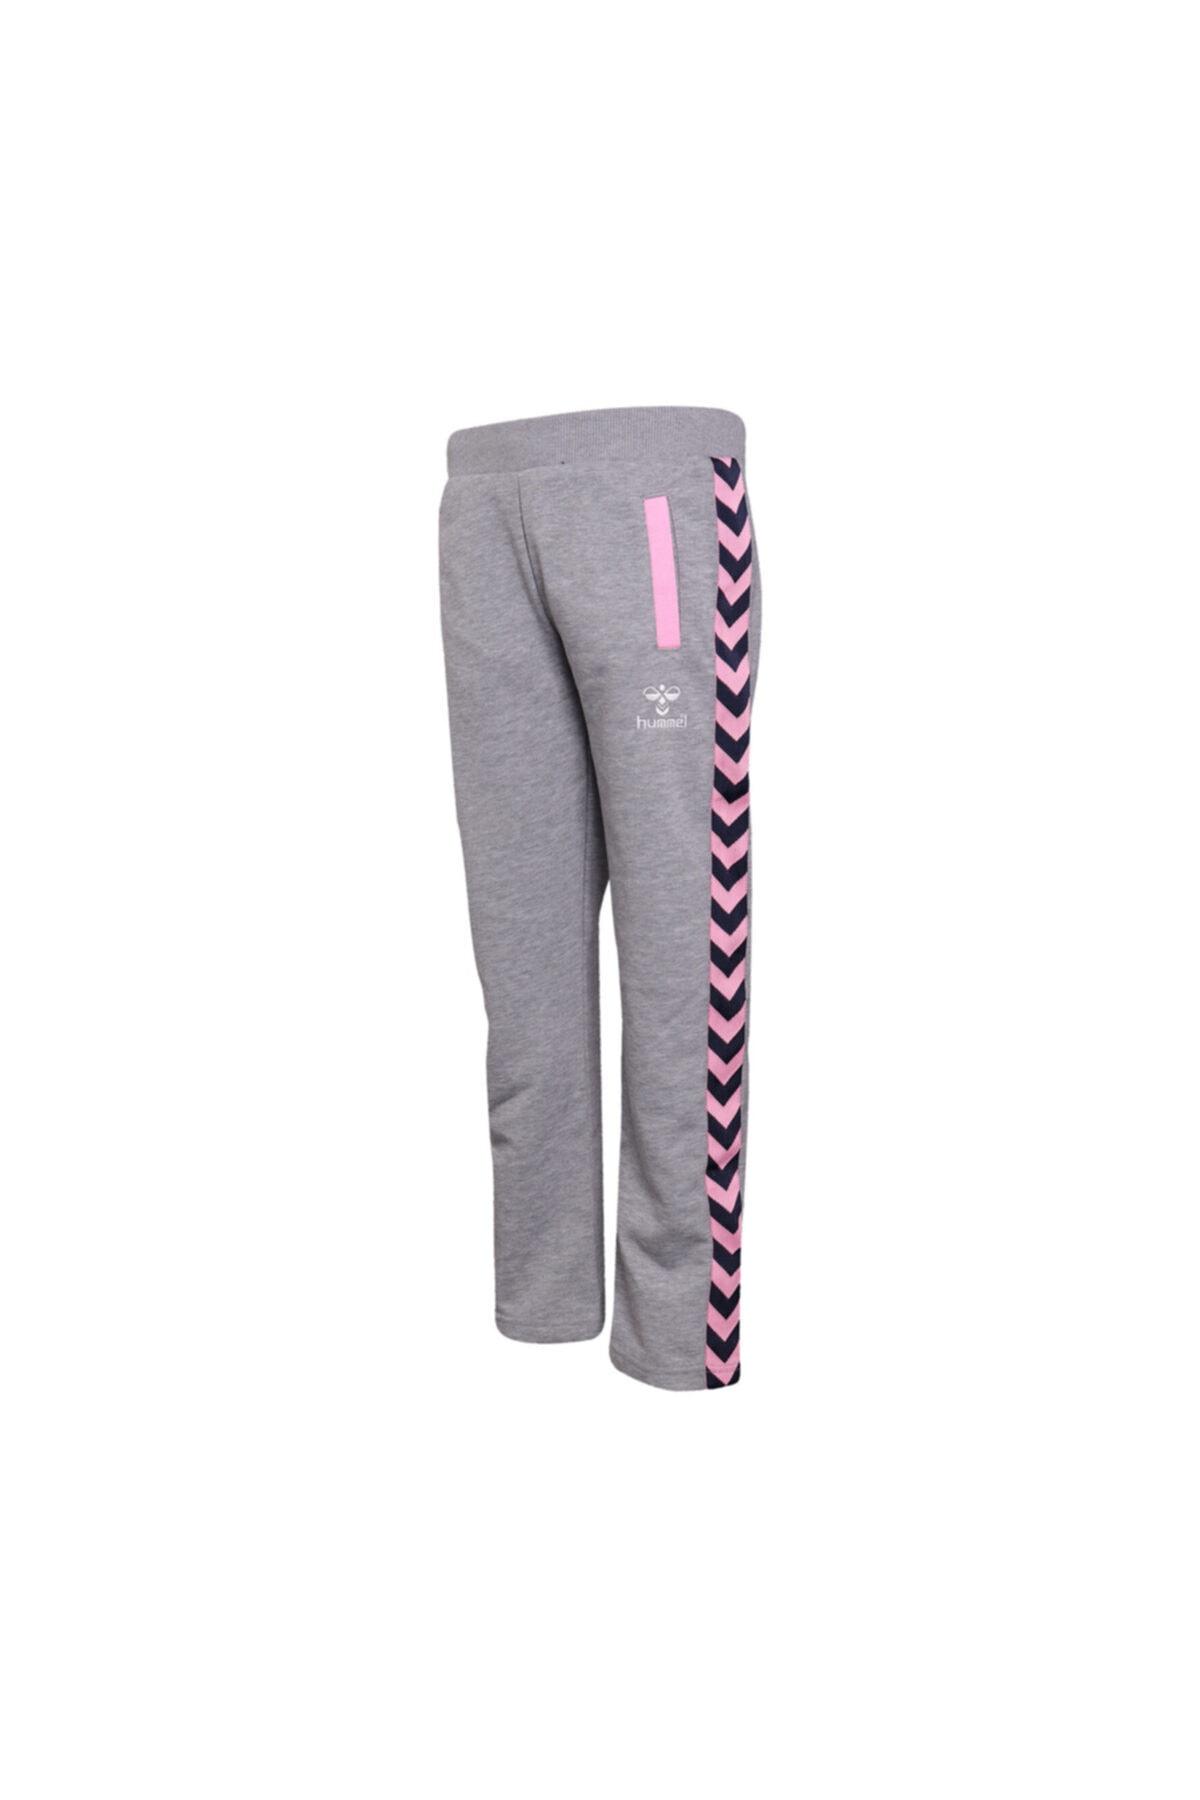 HUMMEL Jarıca Spor Pantolon 1